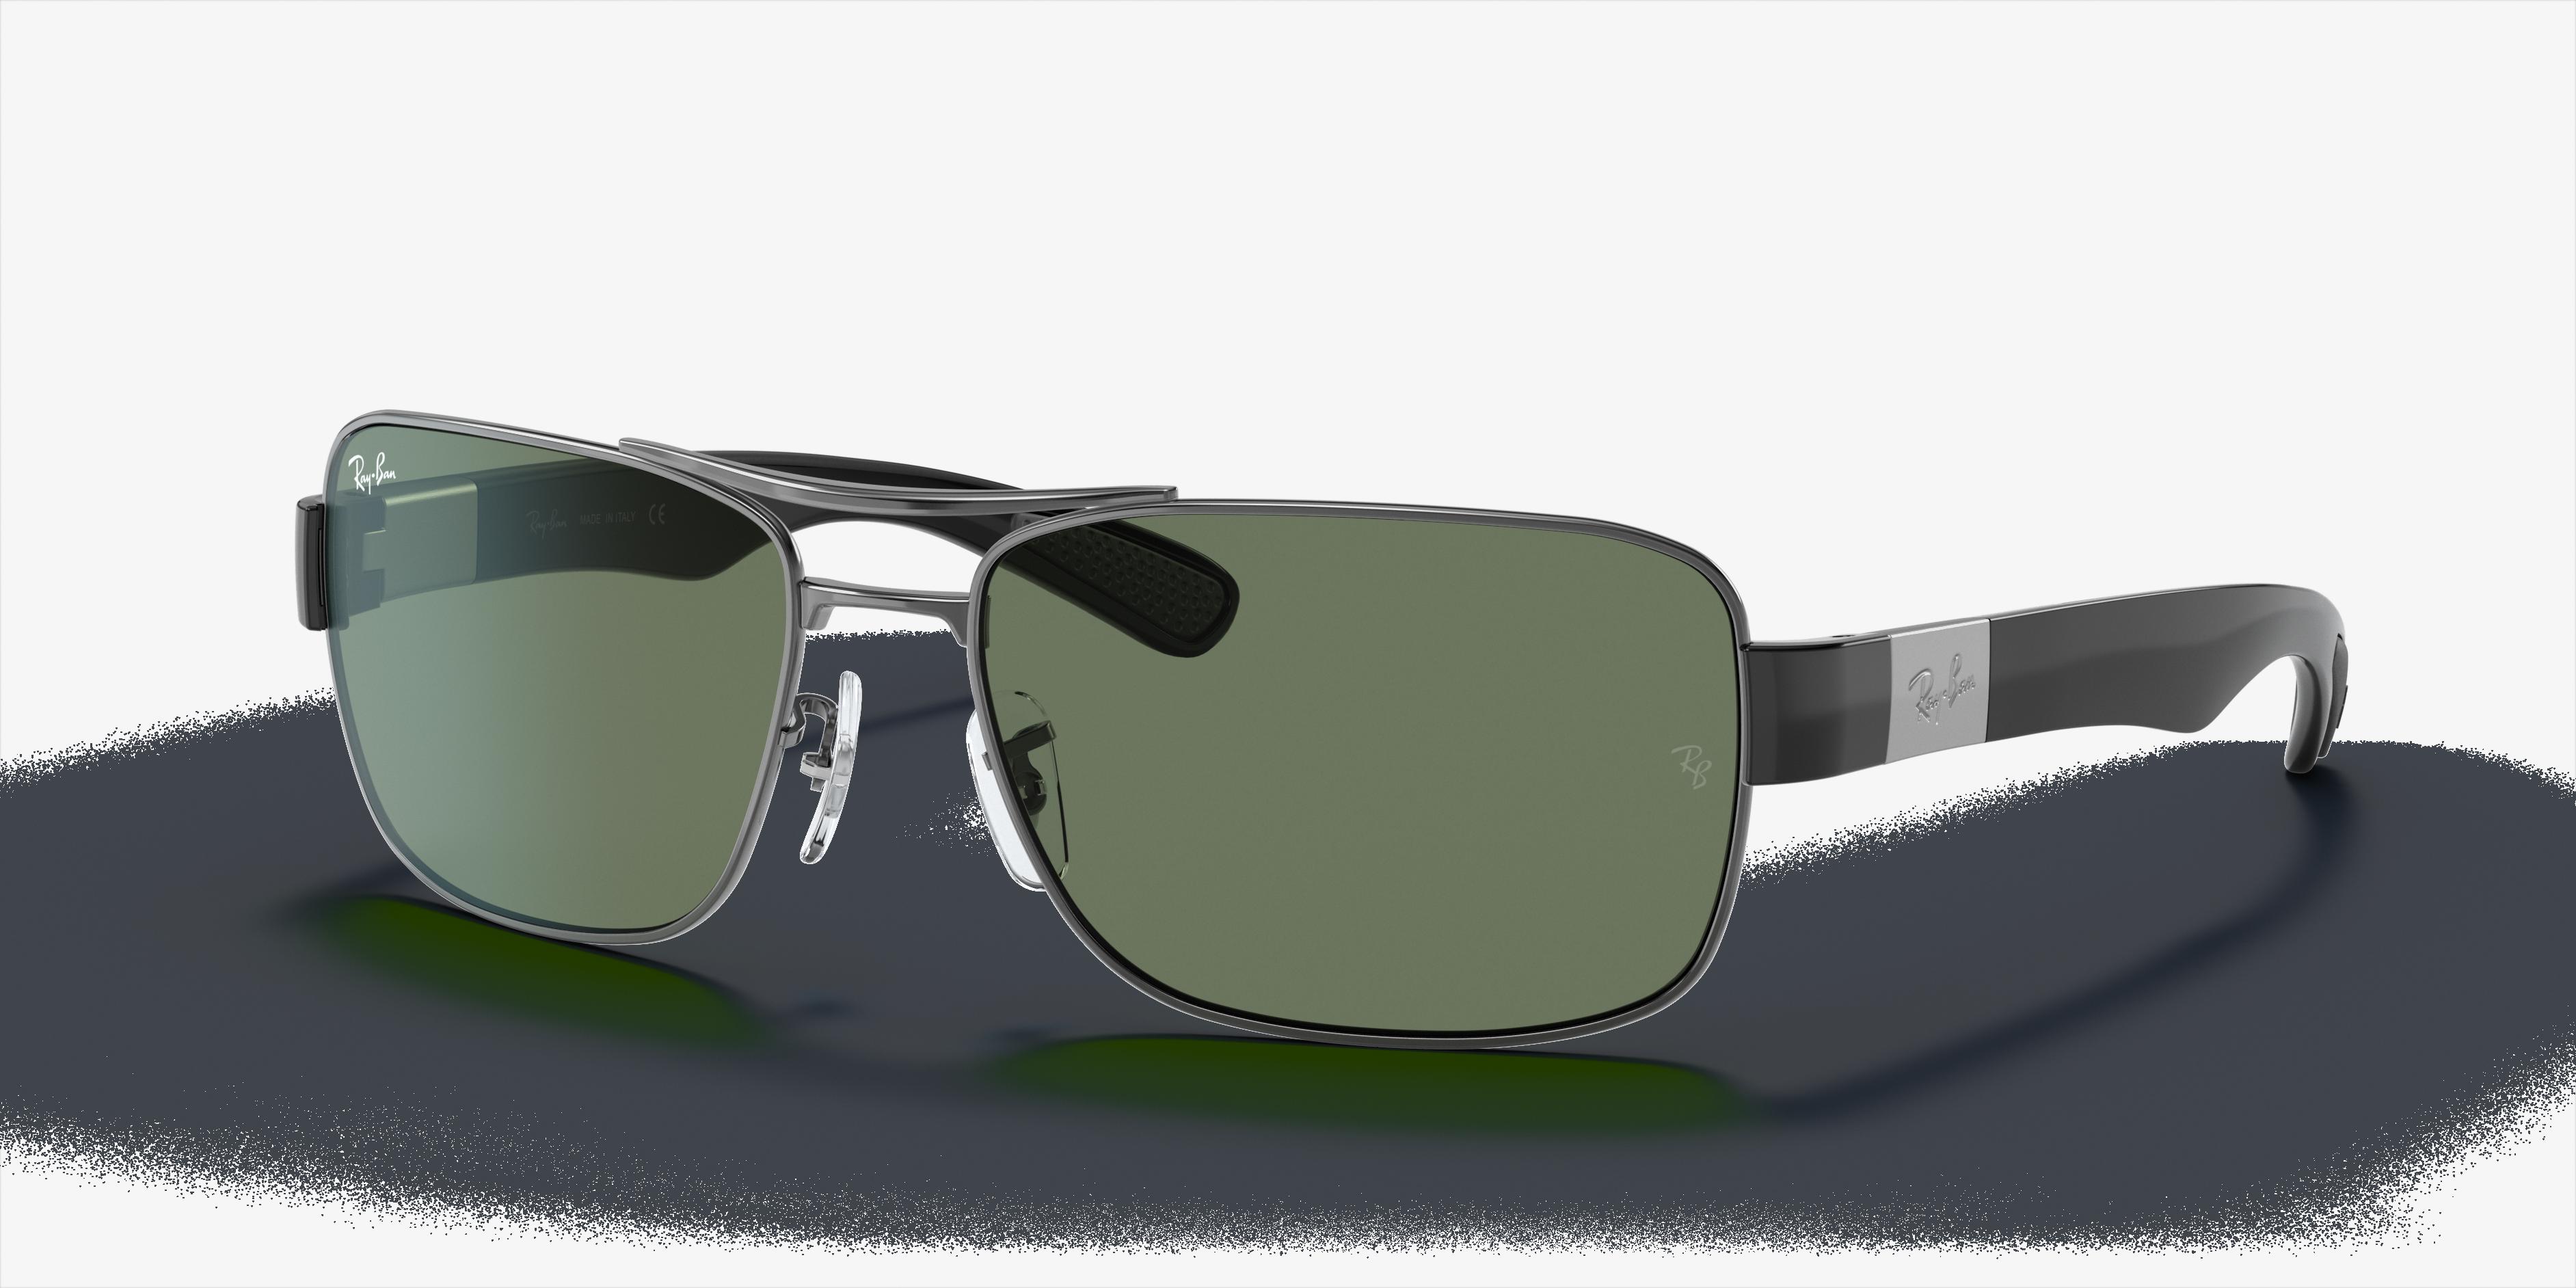 Ray-Ban Rb3522 Gunmetal, Green Lenses - RB3522